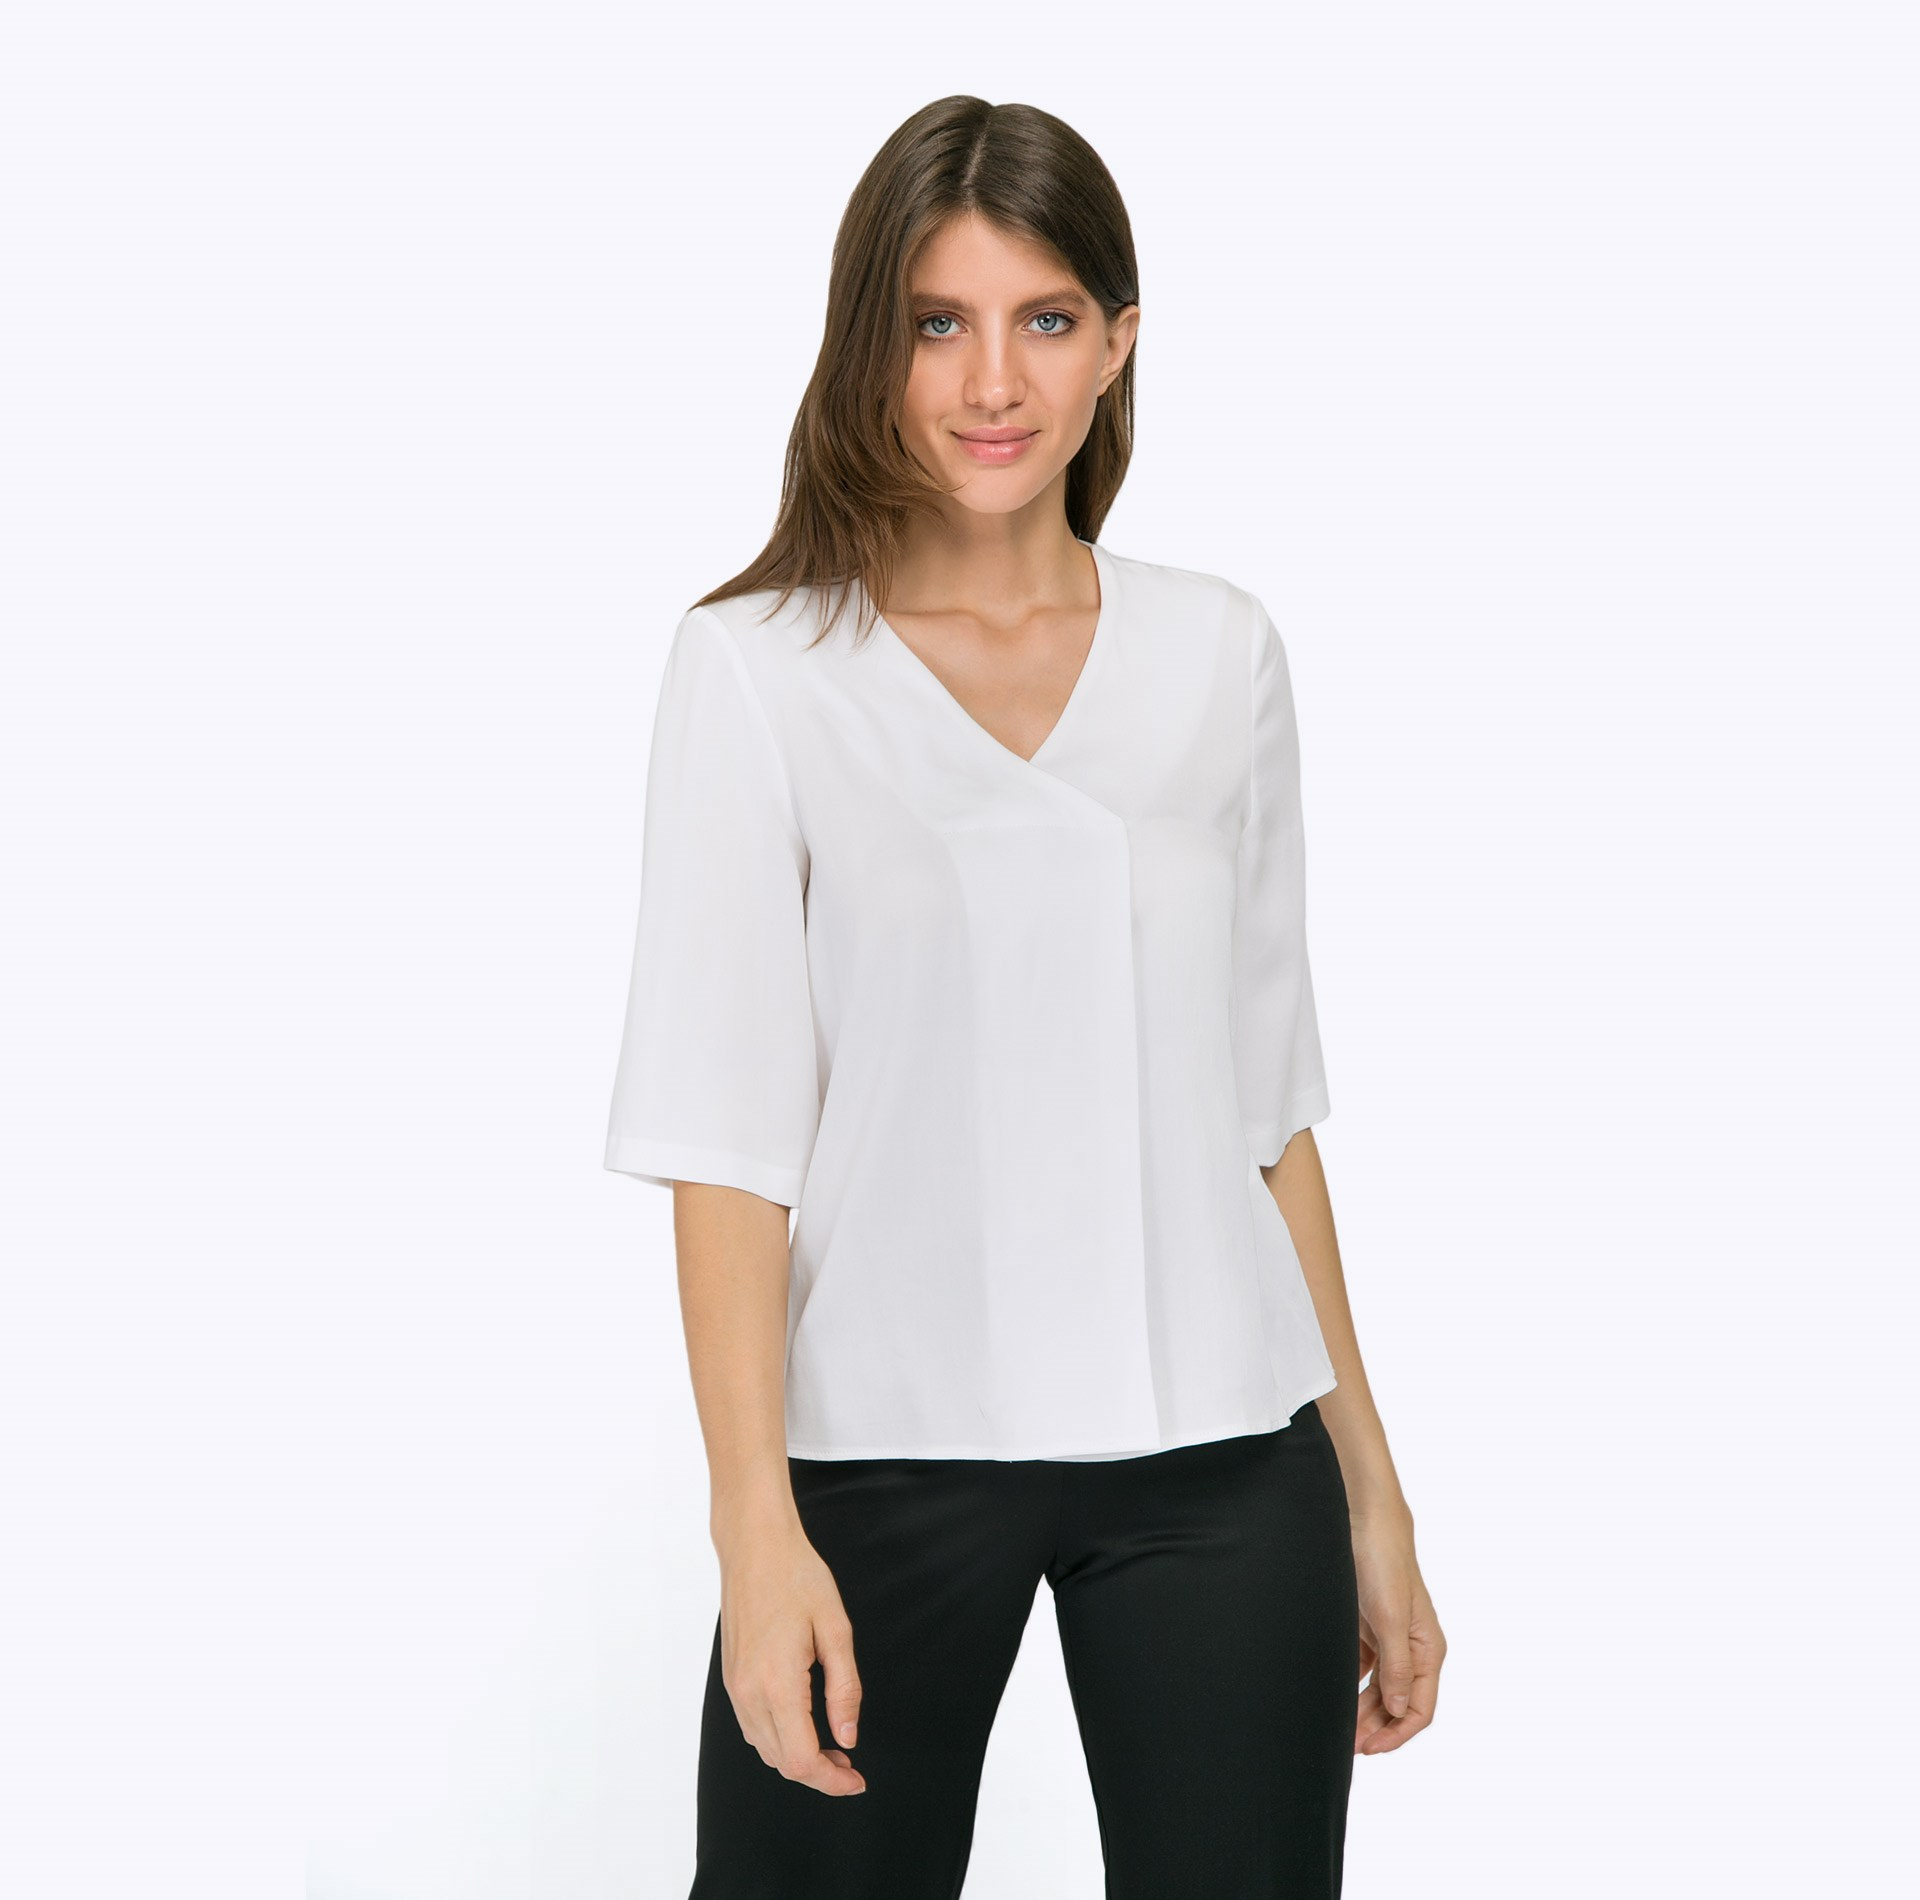 Blouse B2293/desponi ruffle trim blouse